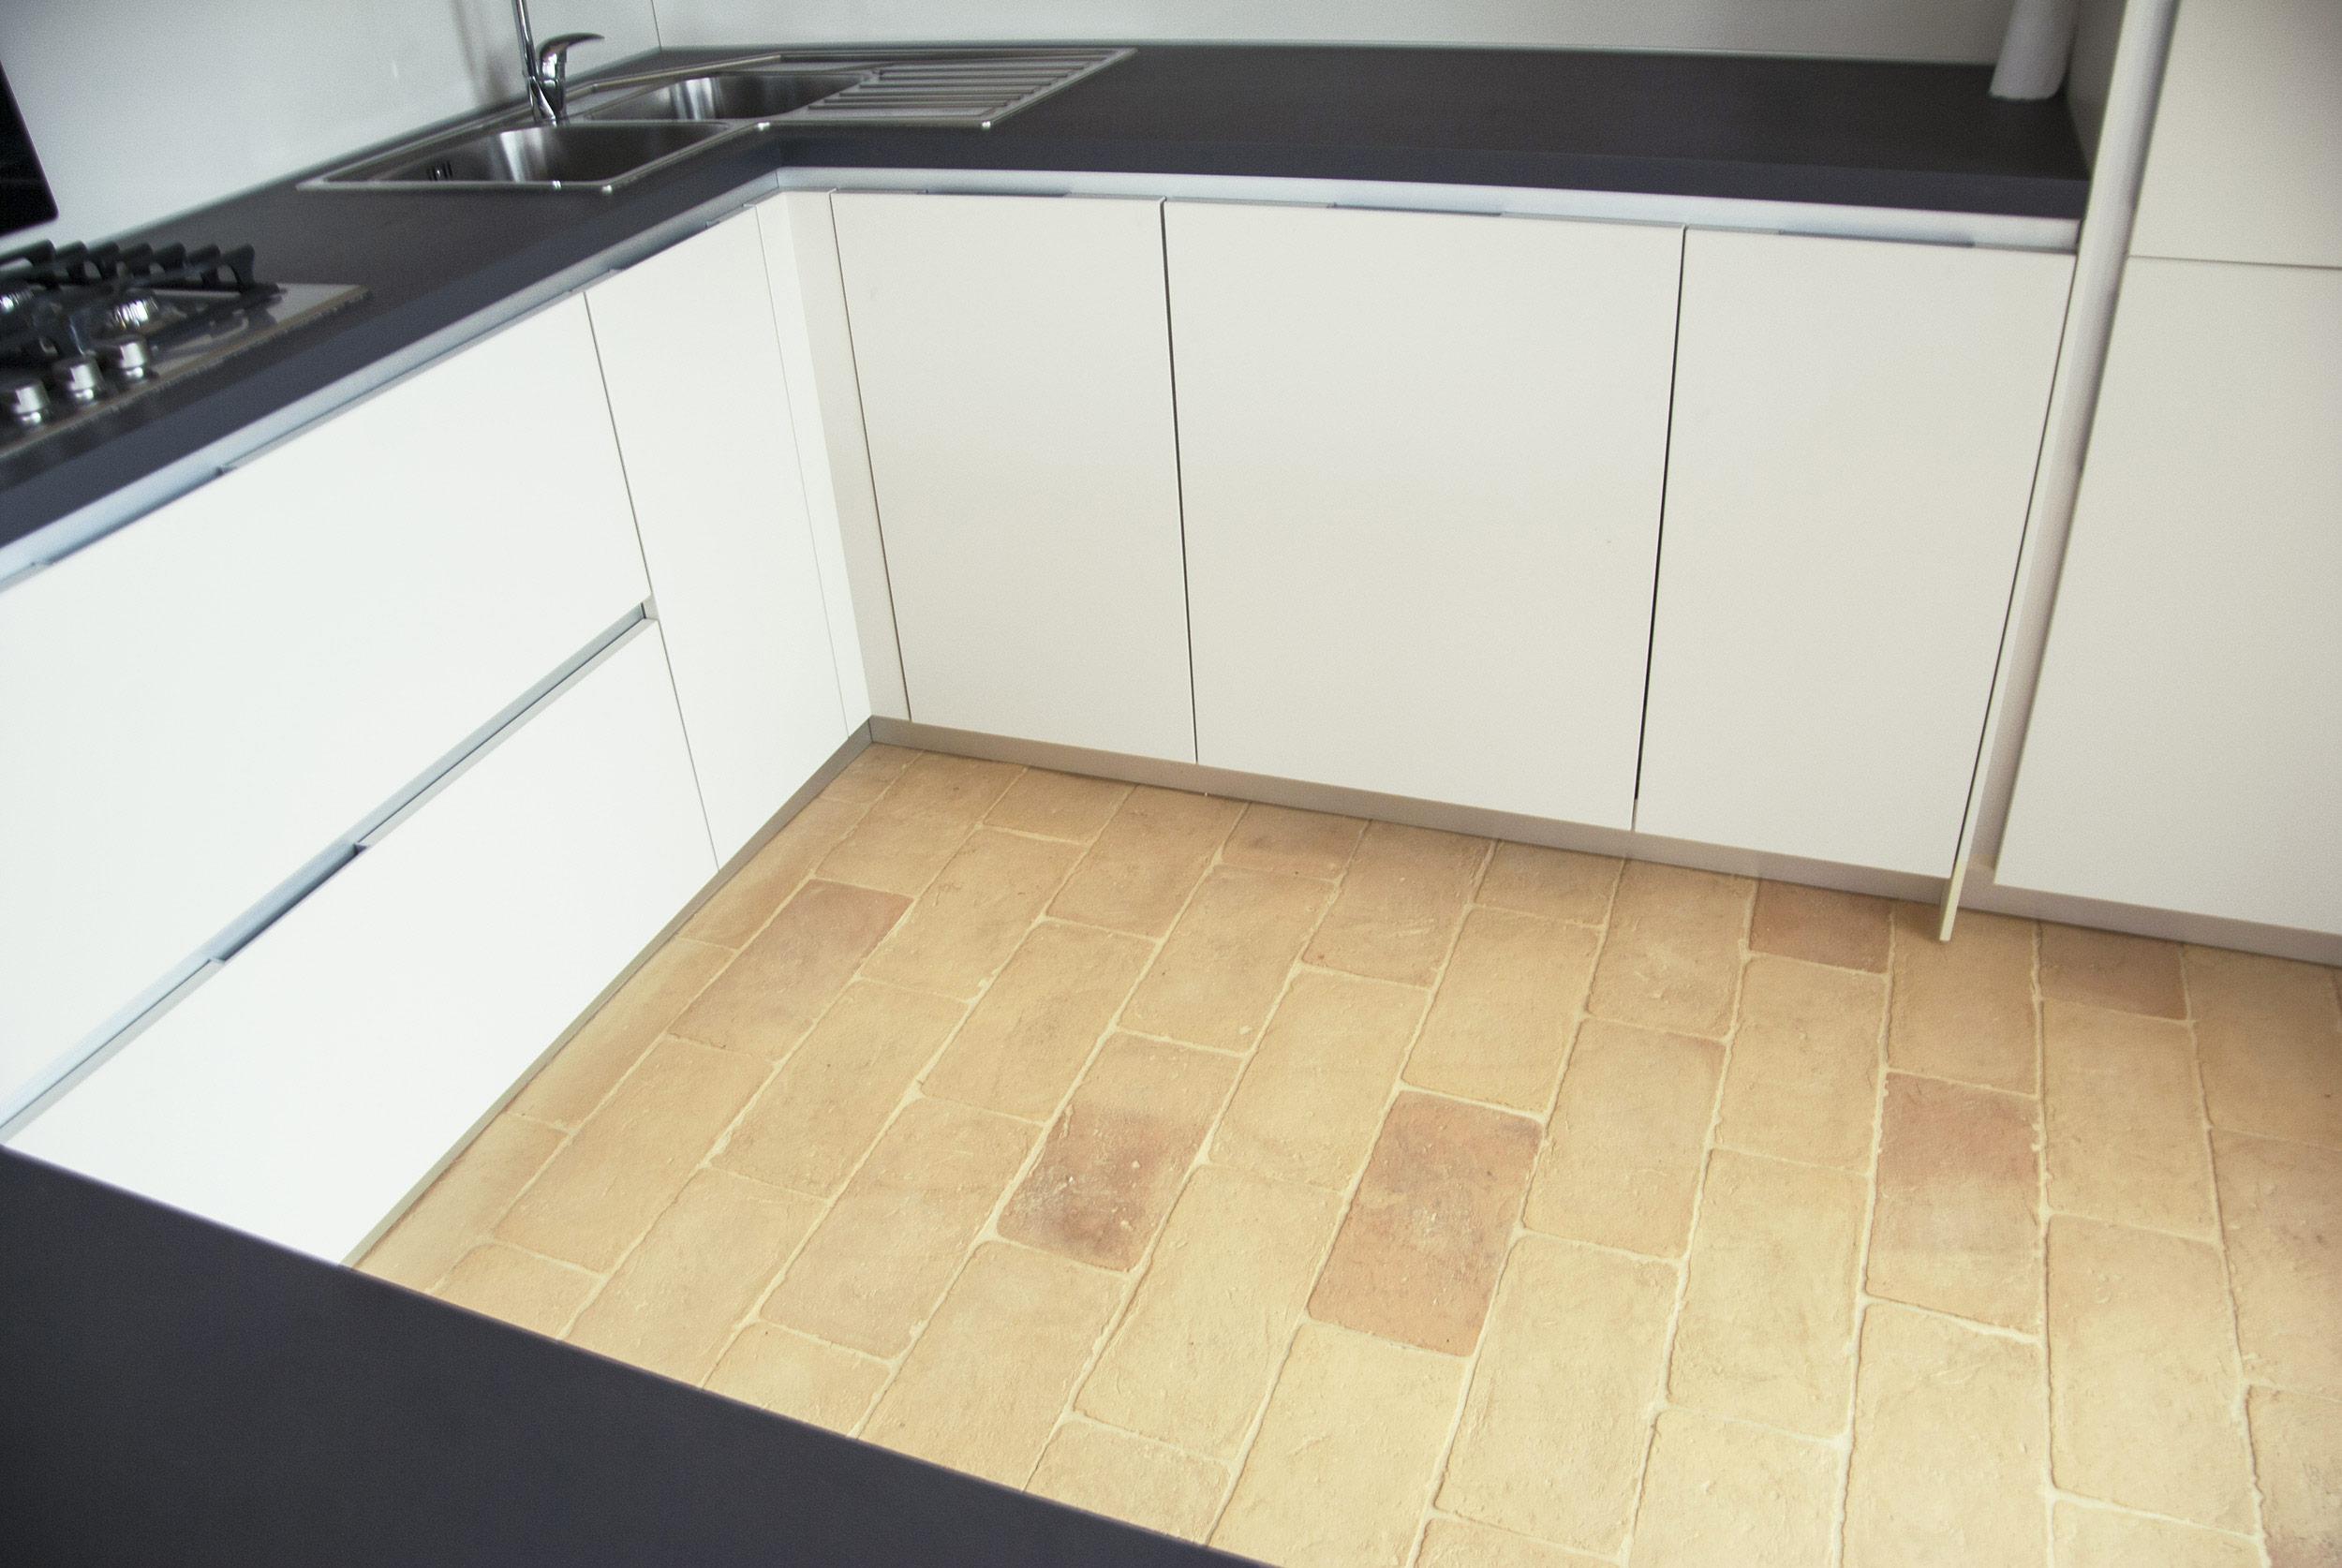 pavimento-in-cotto-cucina-bianca